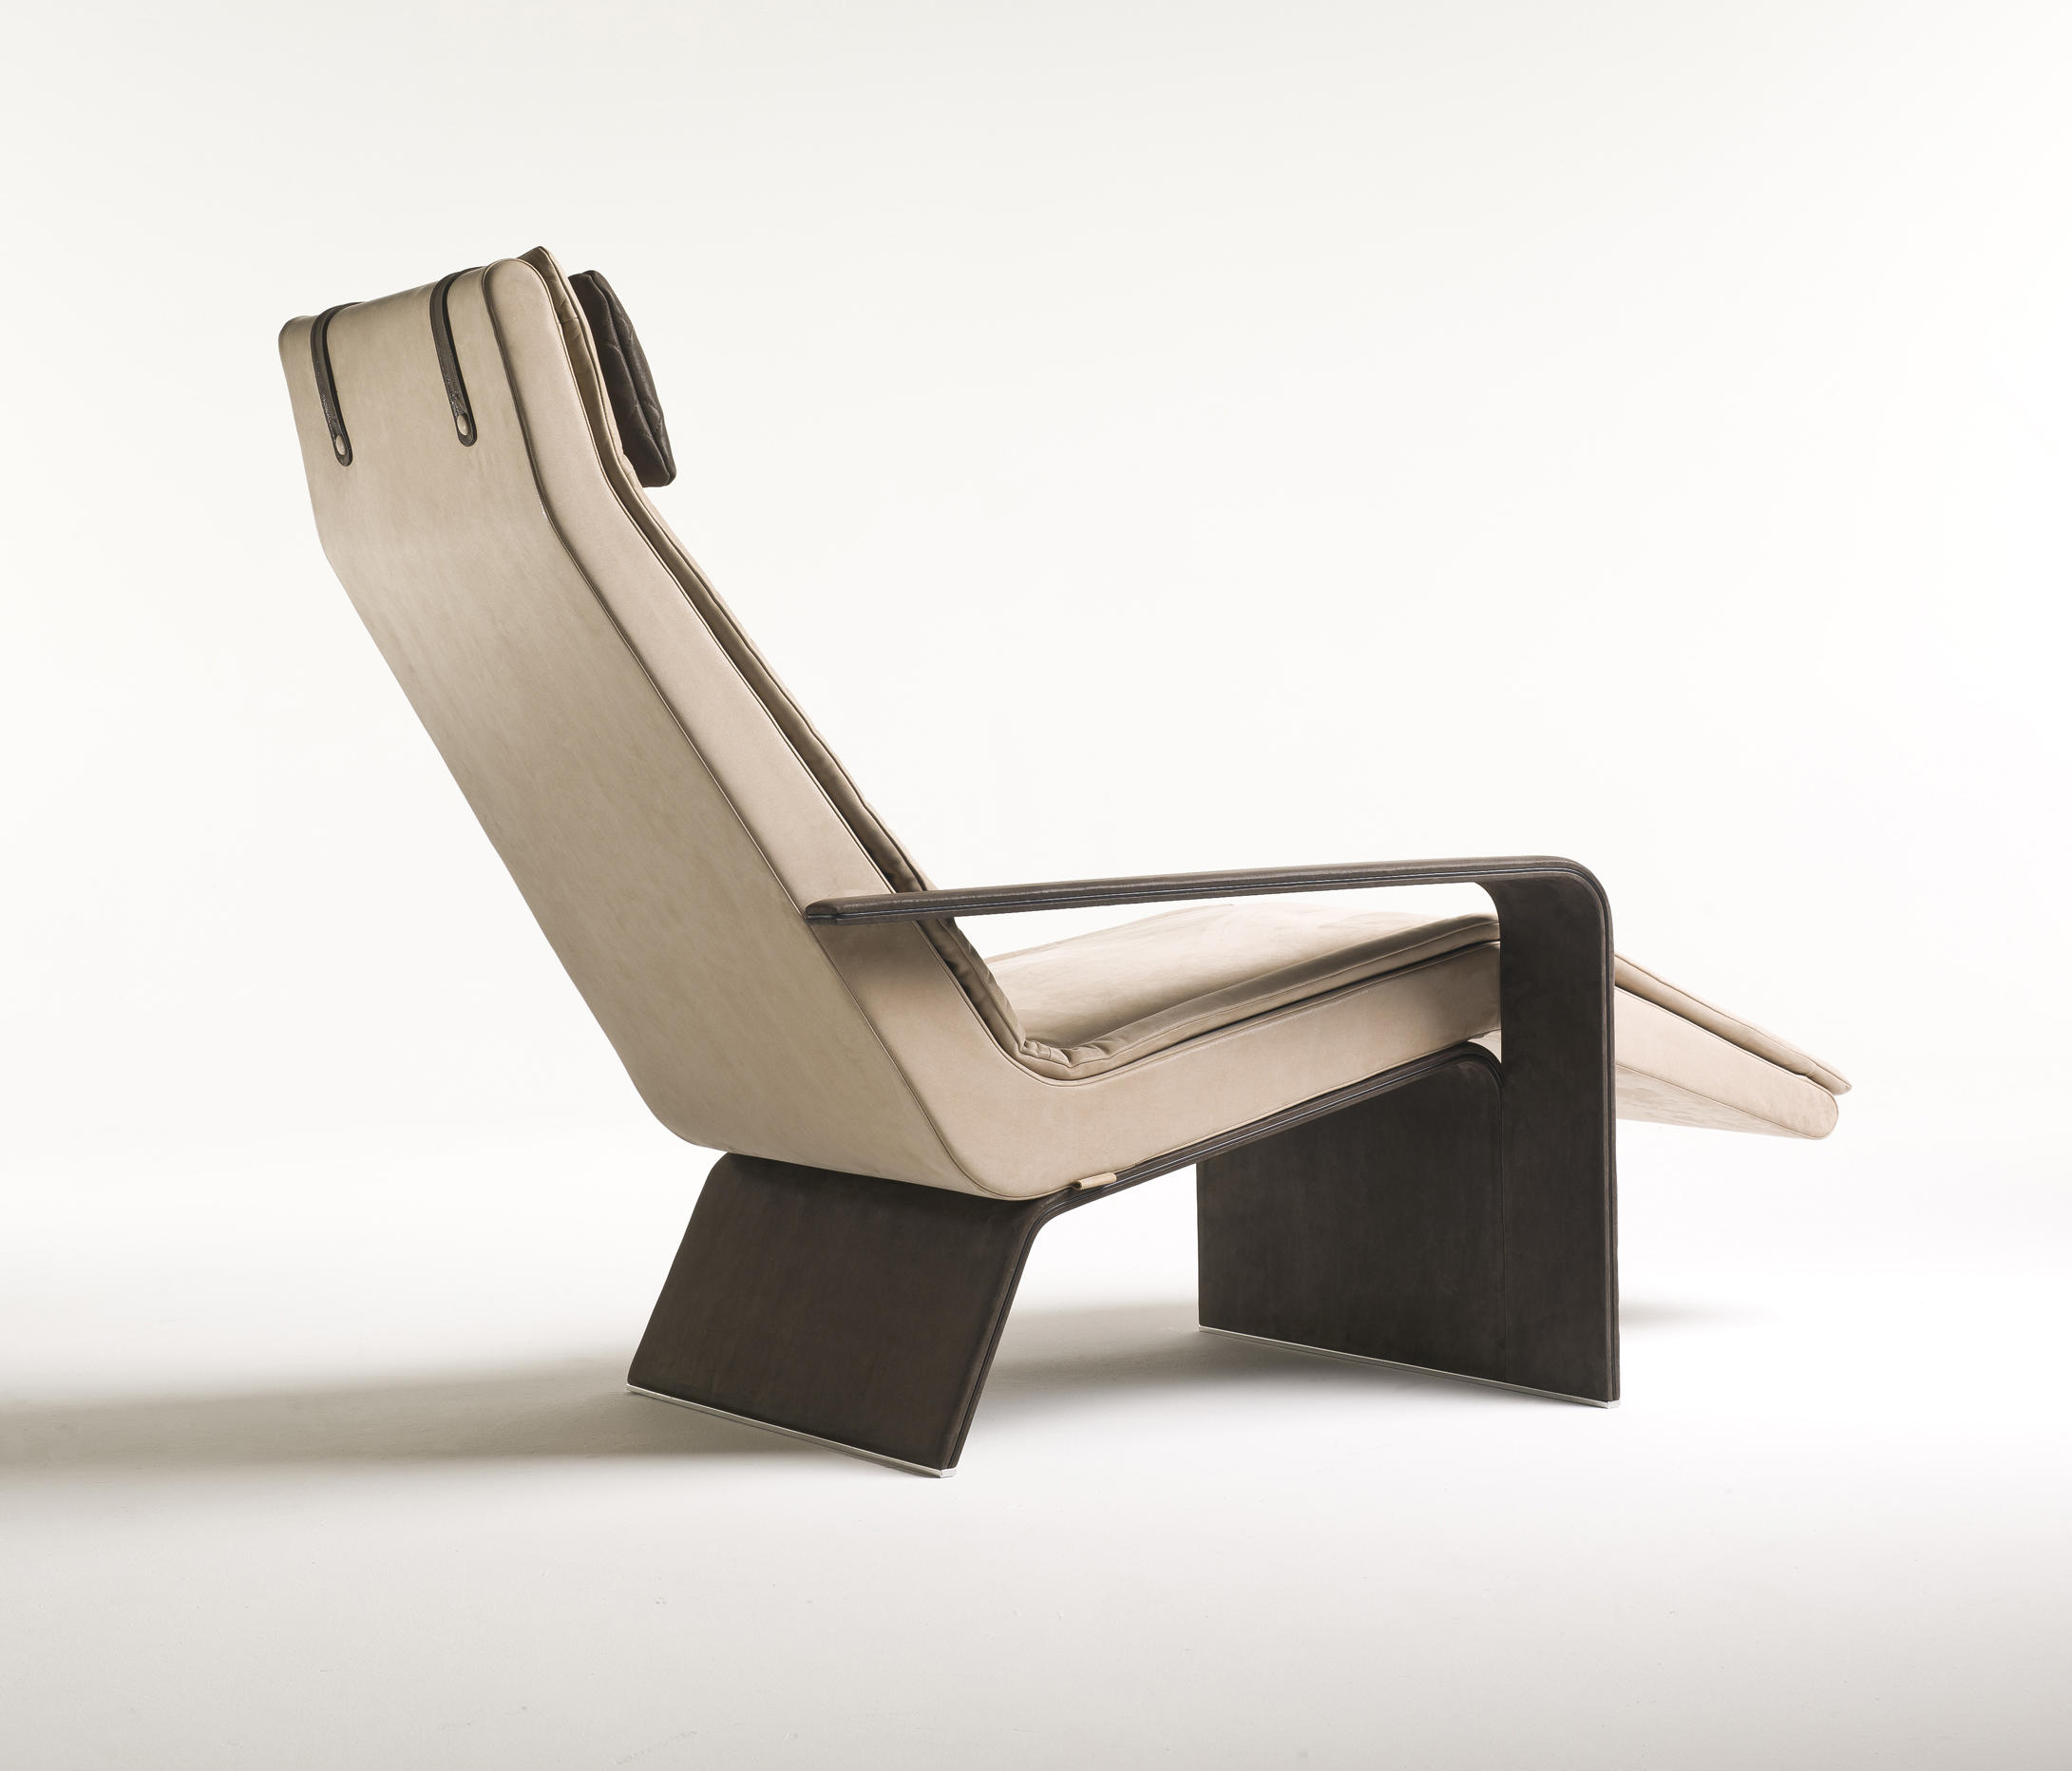 Ala armchairs from i 4 mariani architonic for I 4 mariani